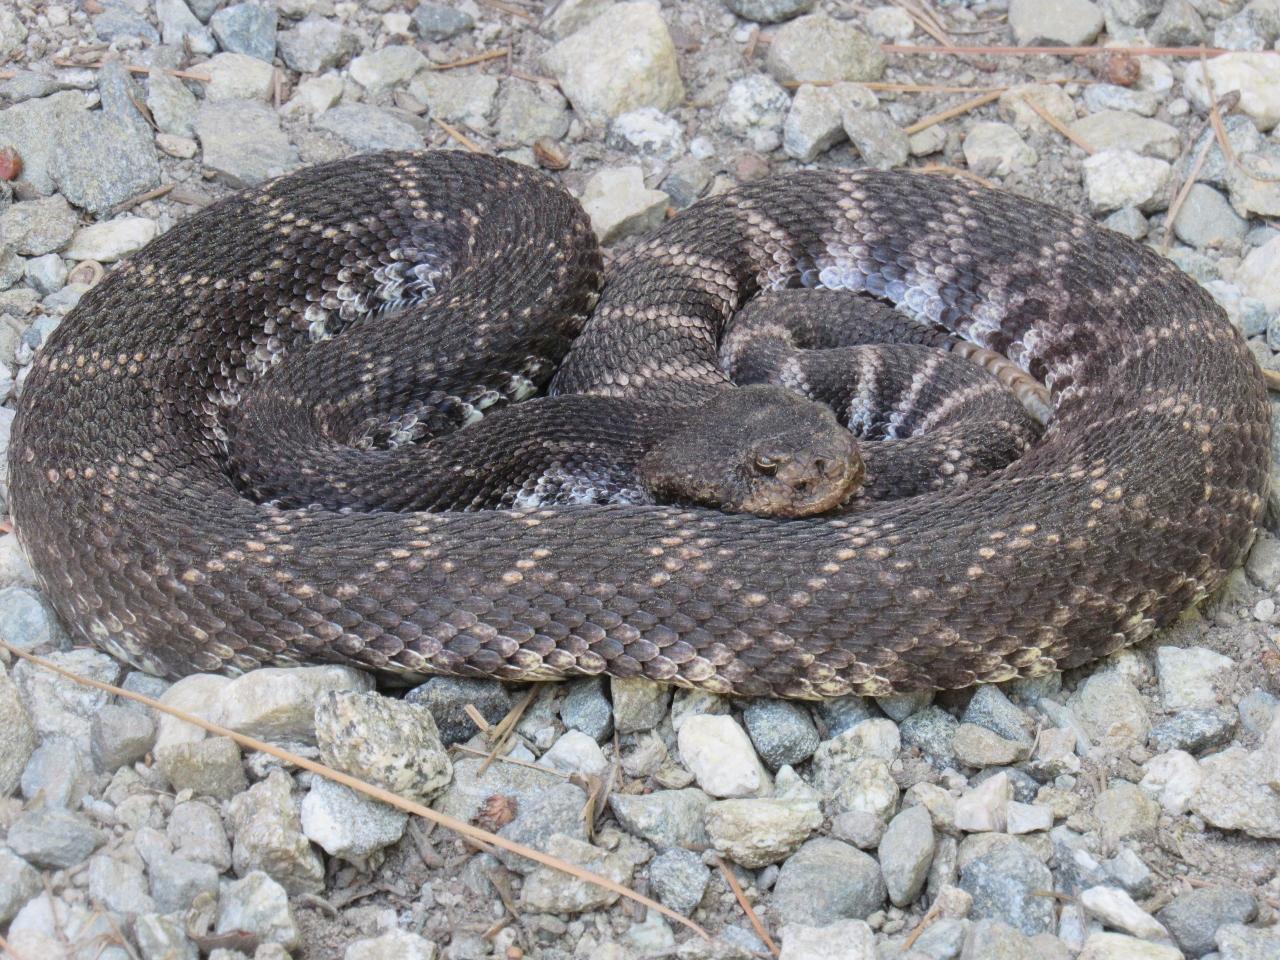 Western diamond back rattlesnake